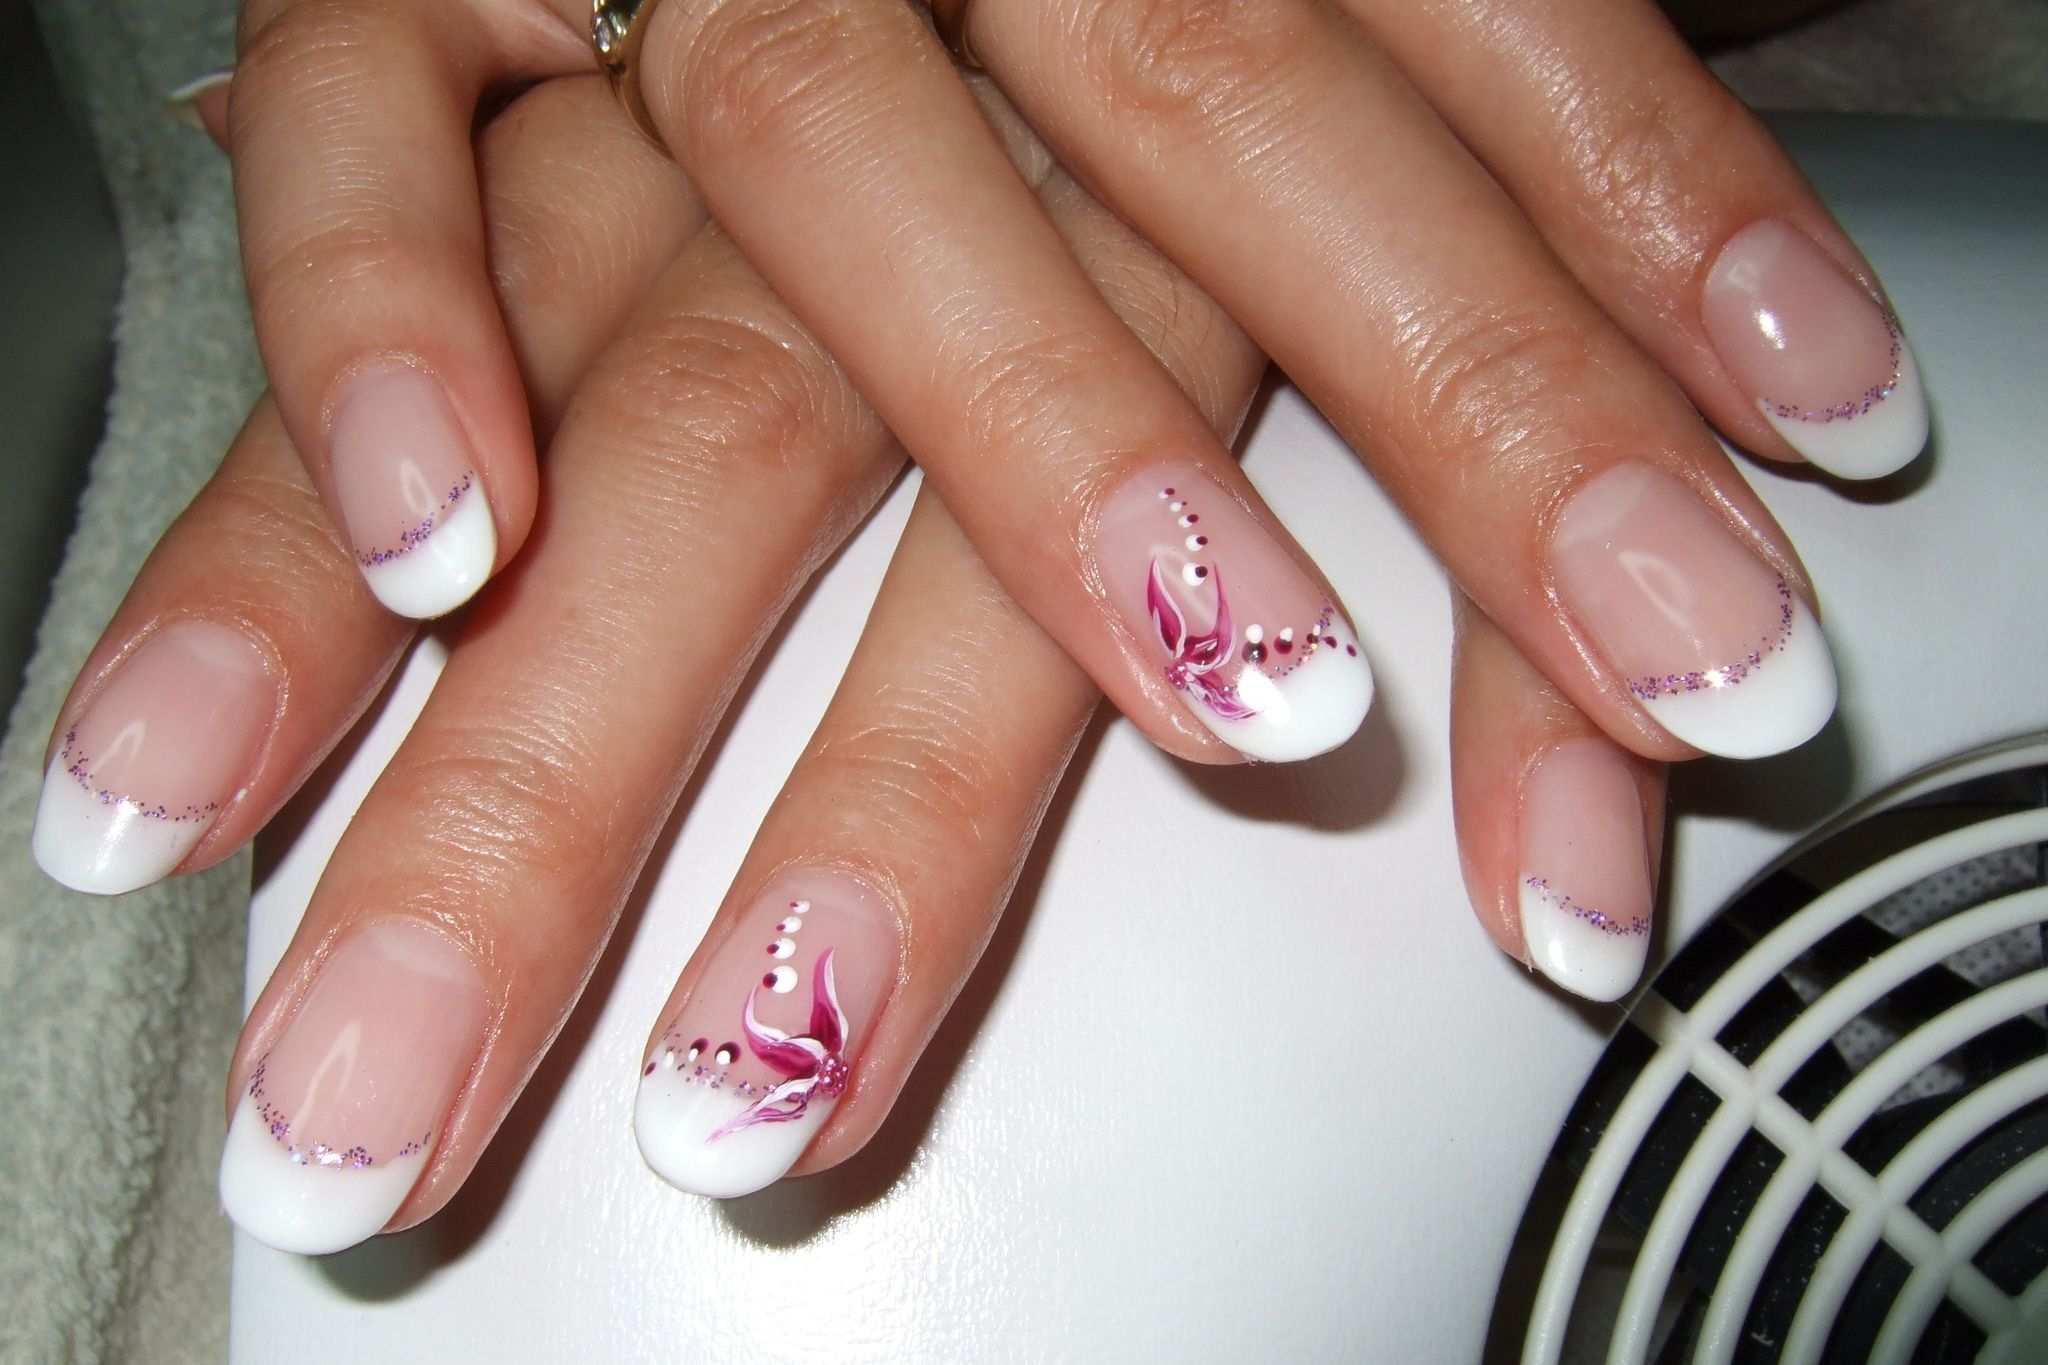 Nageldesign French Nagelstudio Hennie Jolis Ongles Dessins D Ongle Francais Nail Art Designs